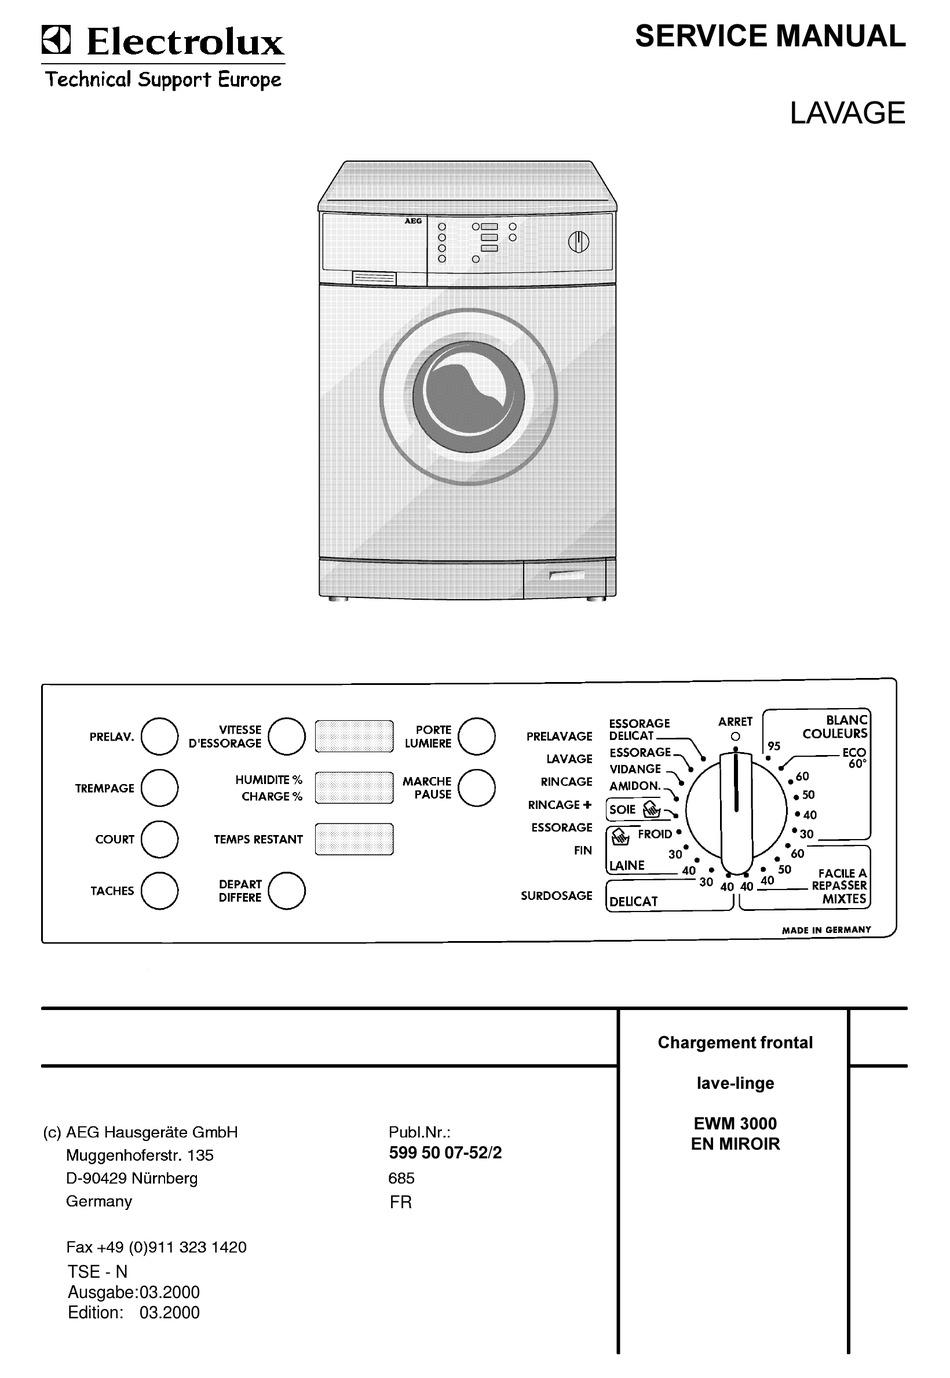 Aeg Lavage Service Manual Pdf Download Manualslib